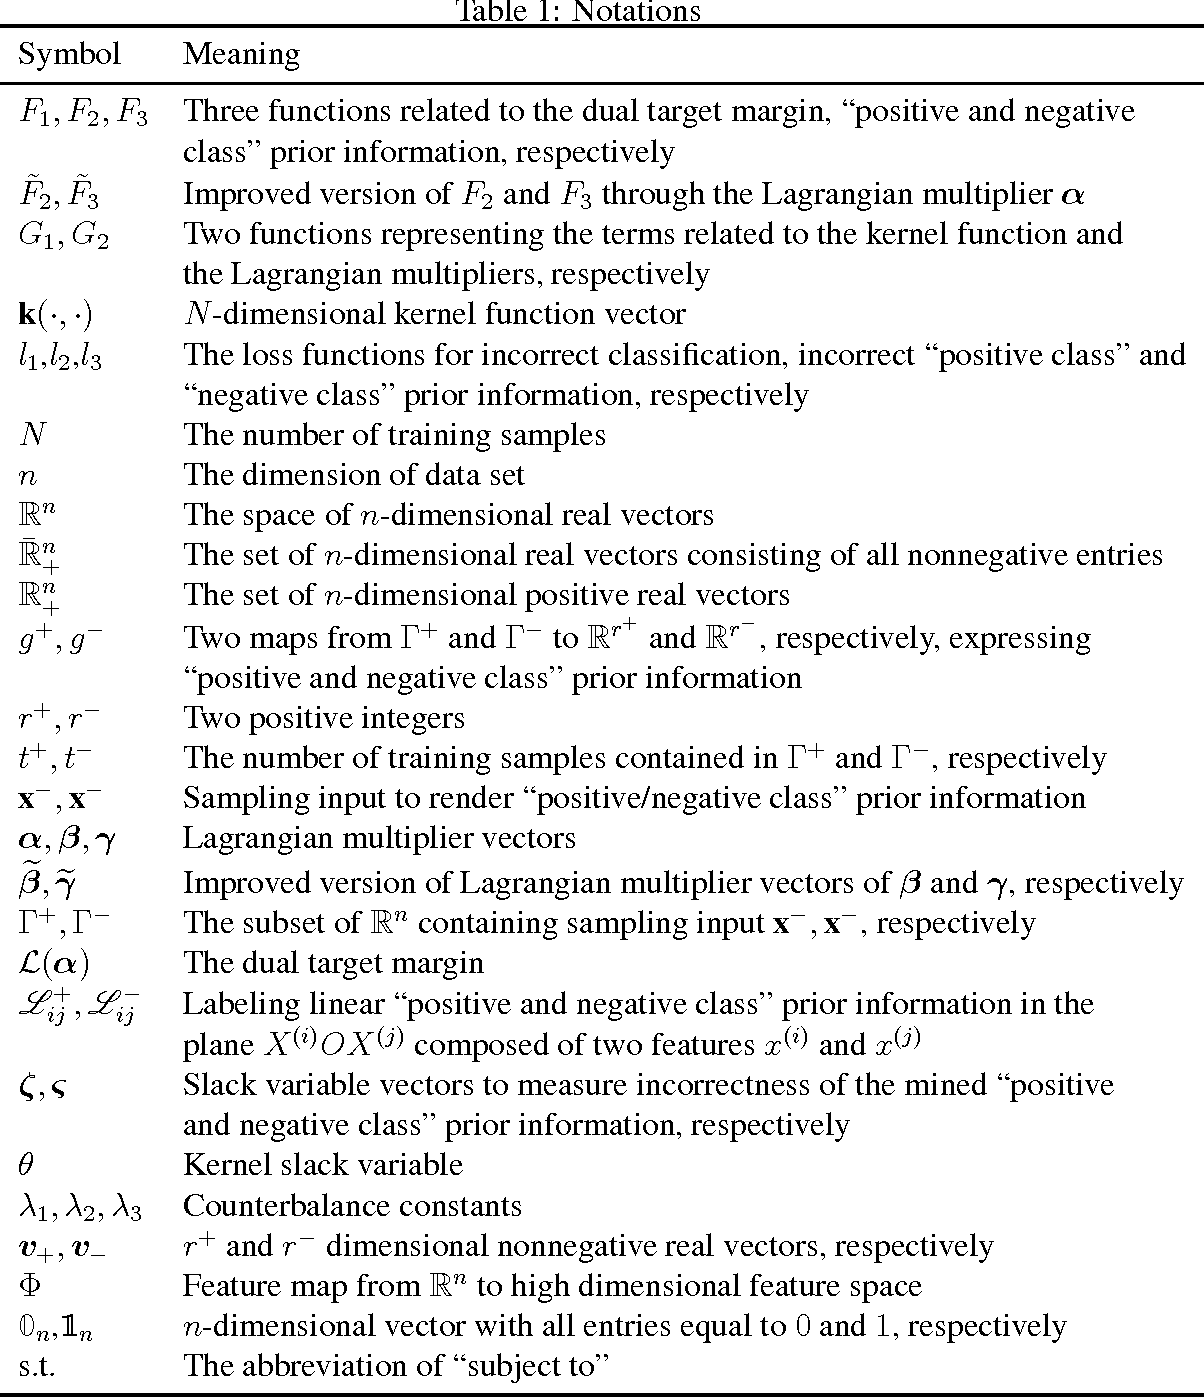 Figure 2 for Enhancing Transparency of Black-box Soft-margin SVM by Integrating Data-based Prior Information